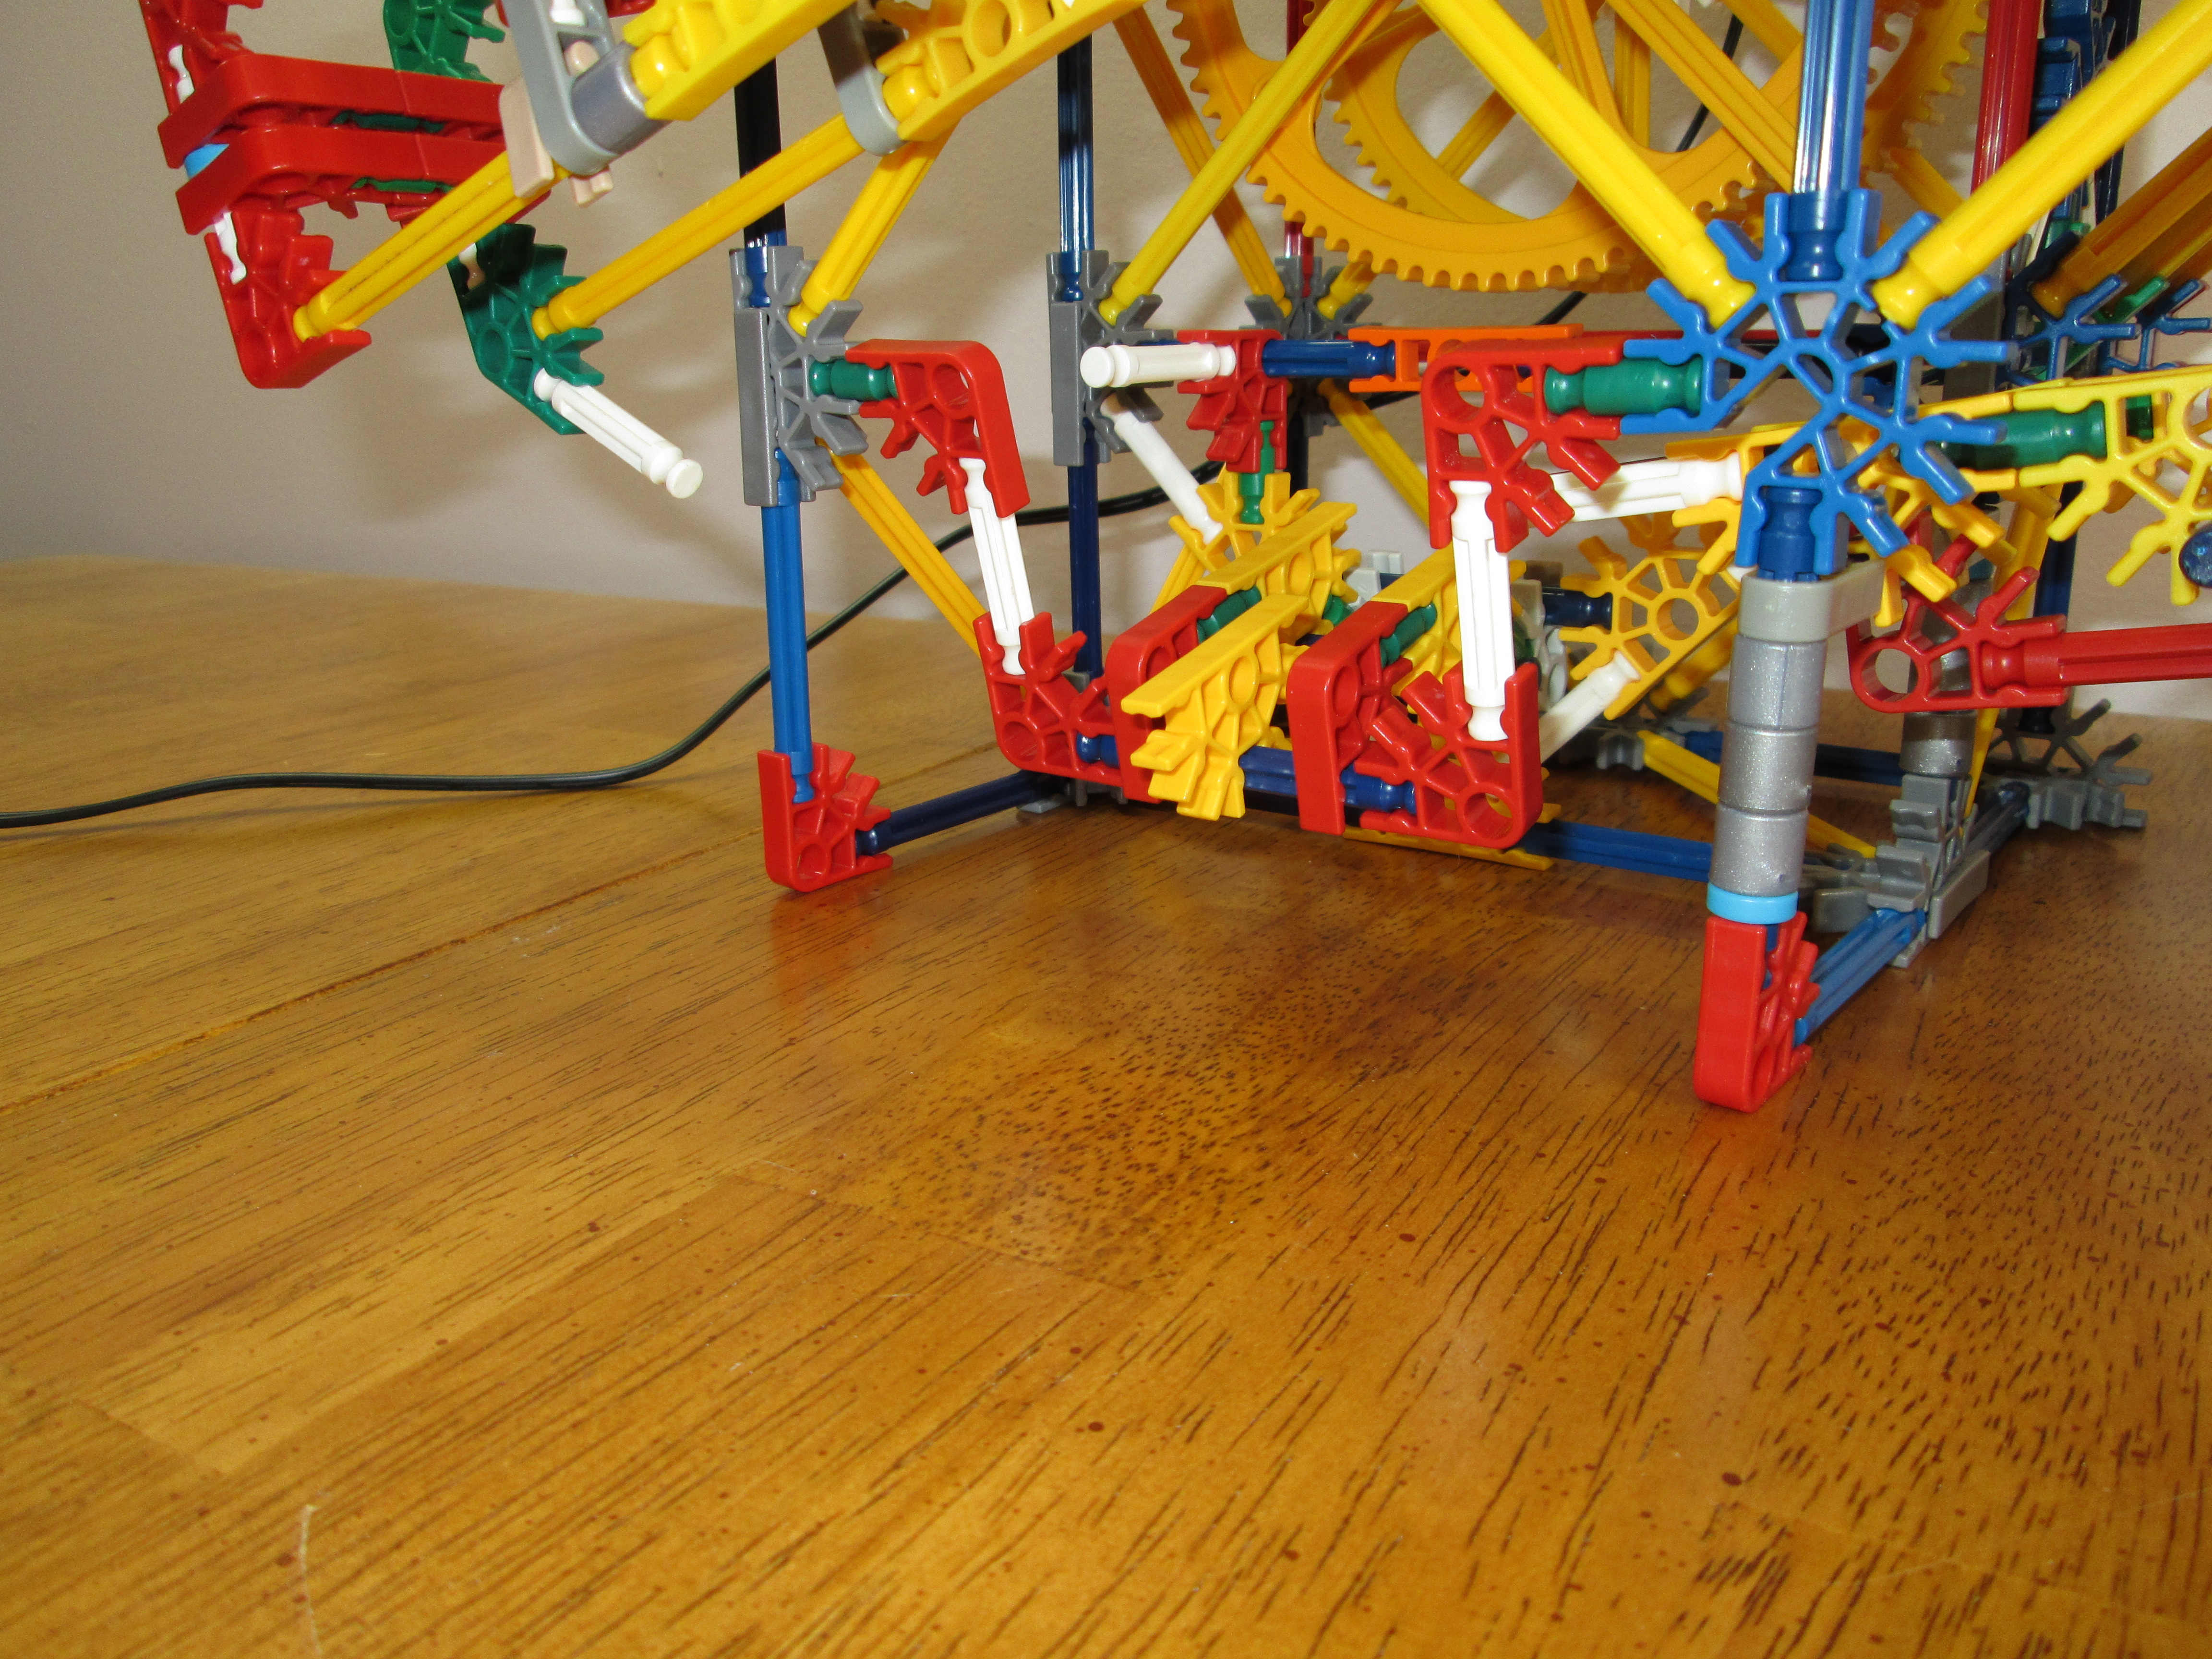 Knex Ball Machine Lift: Endless Arm Lift